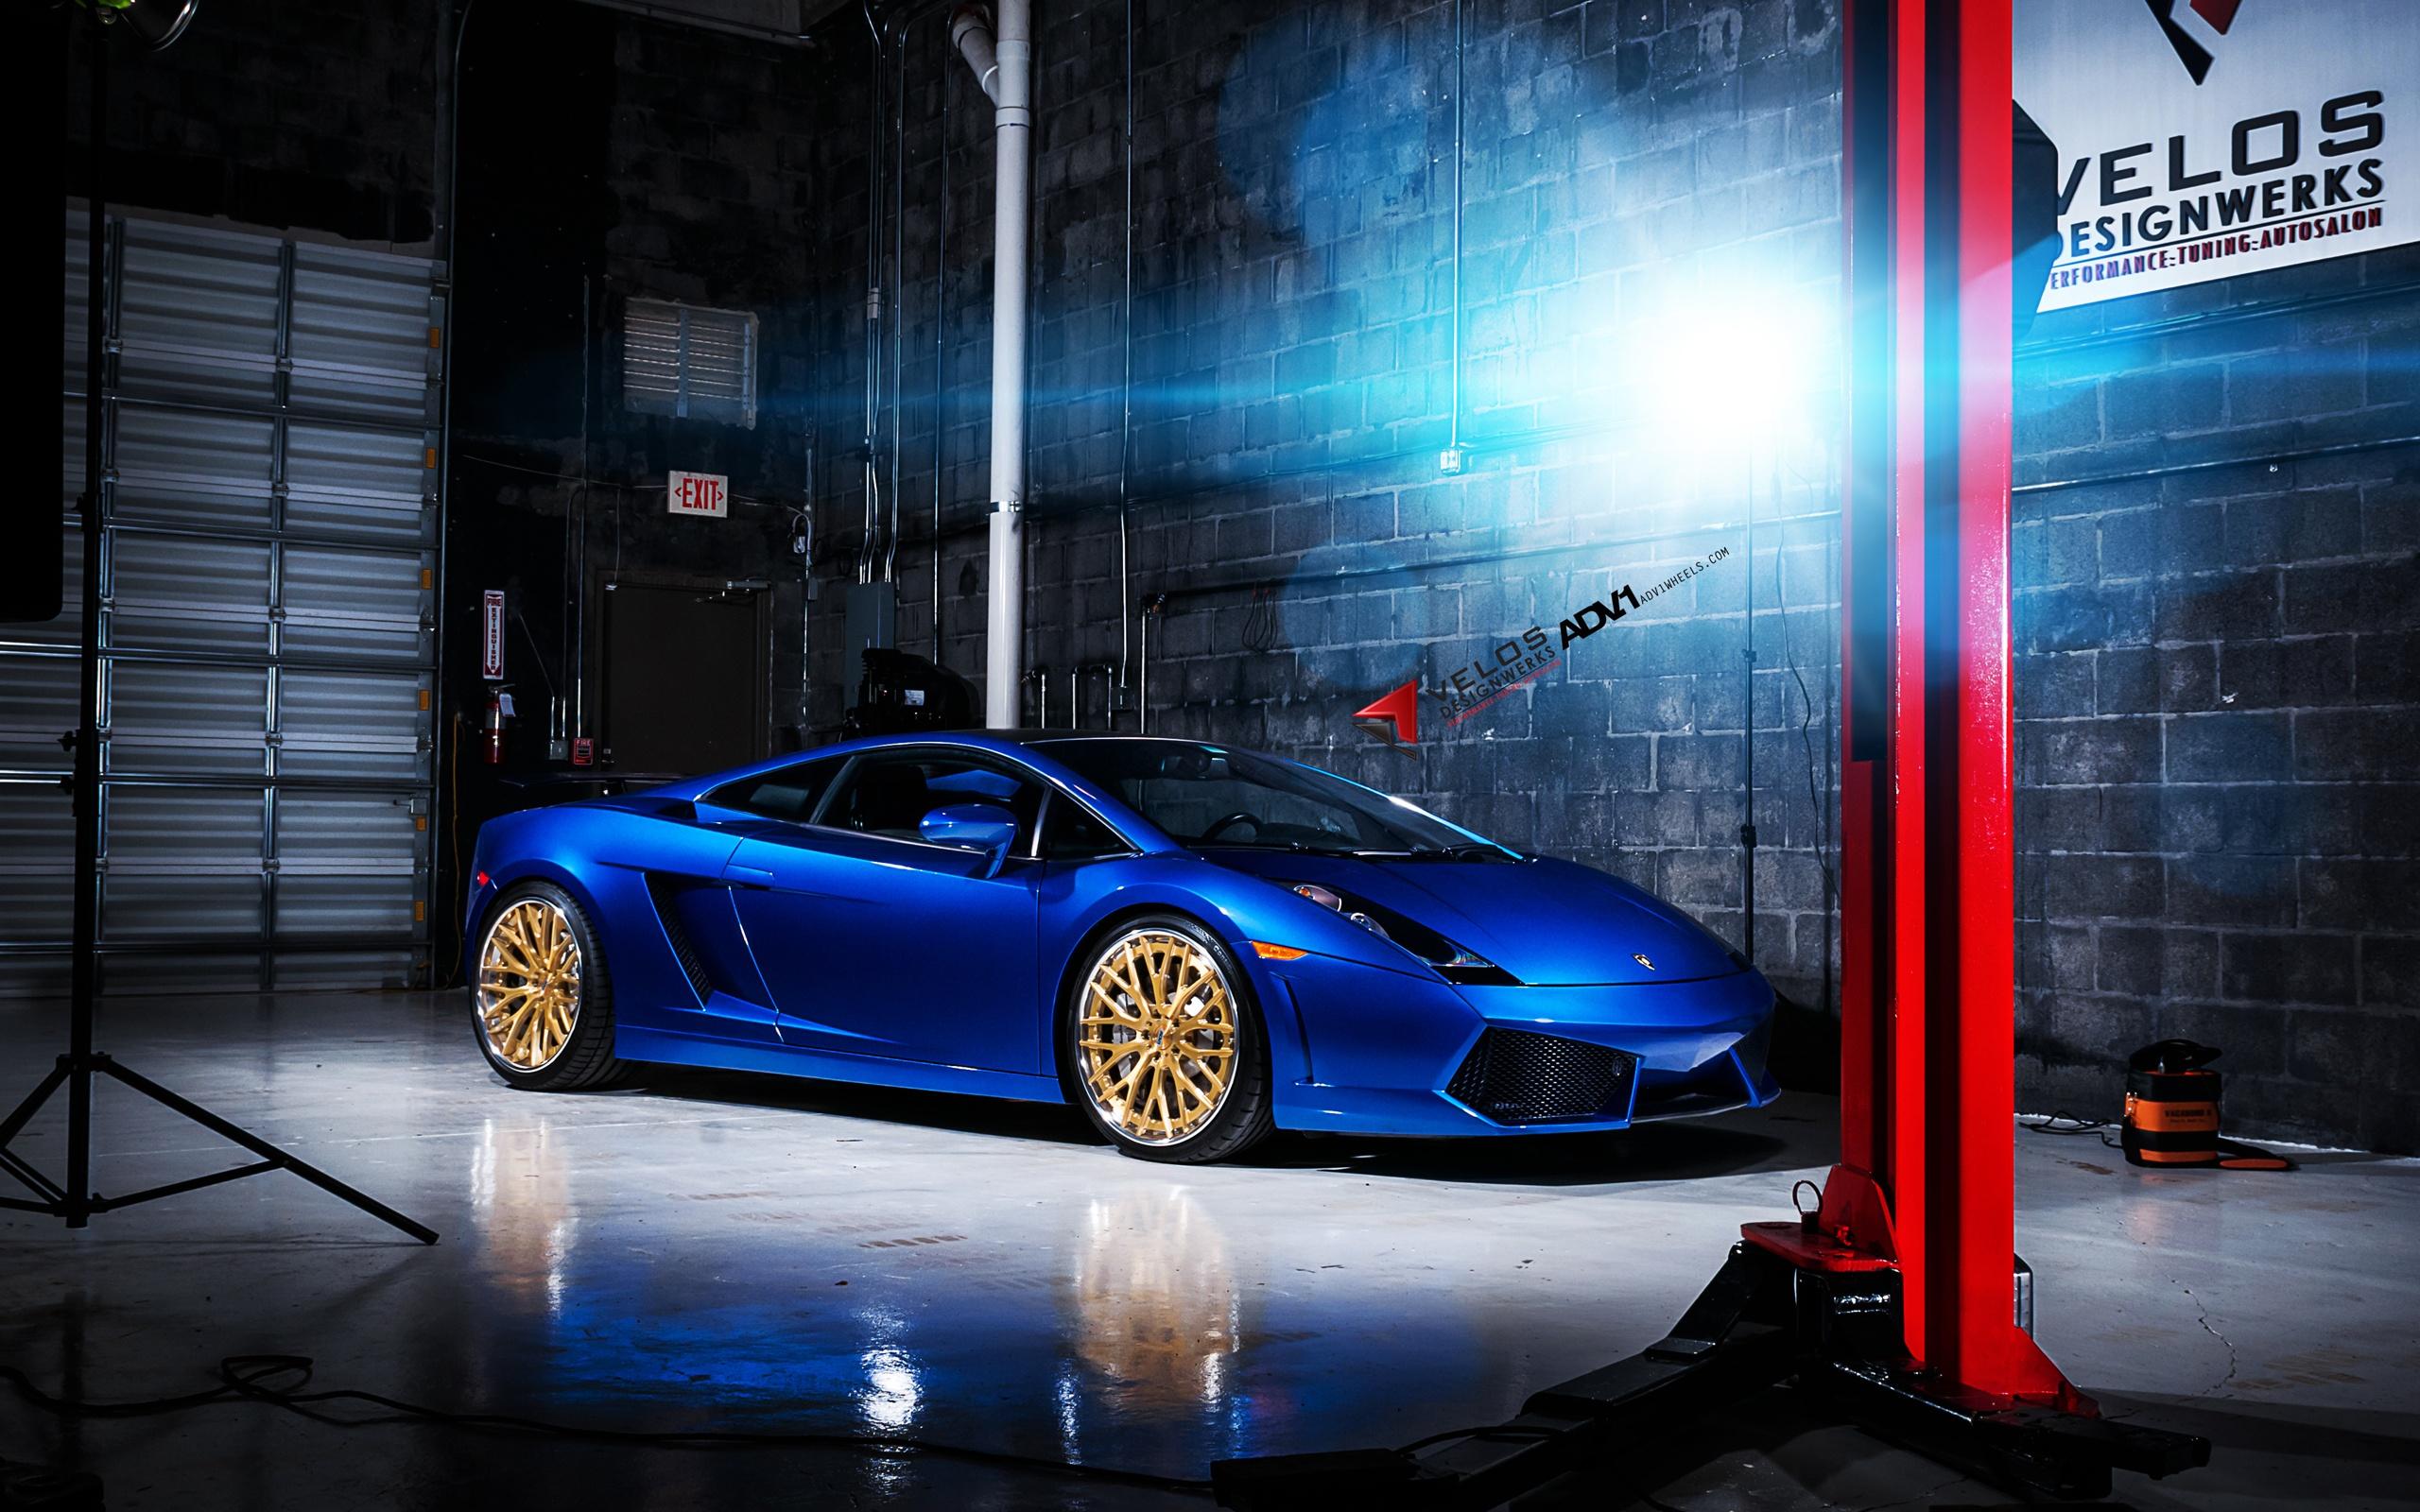 Adv1 Wheels Lamborghini Gallardo Wallpapers In Jpg Format For Free